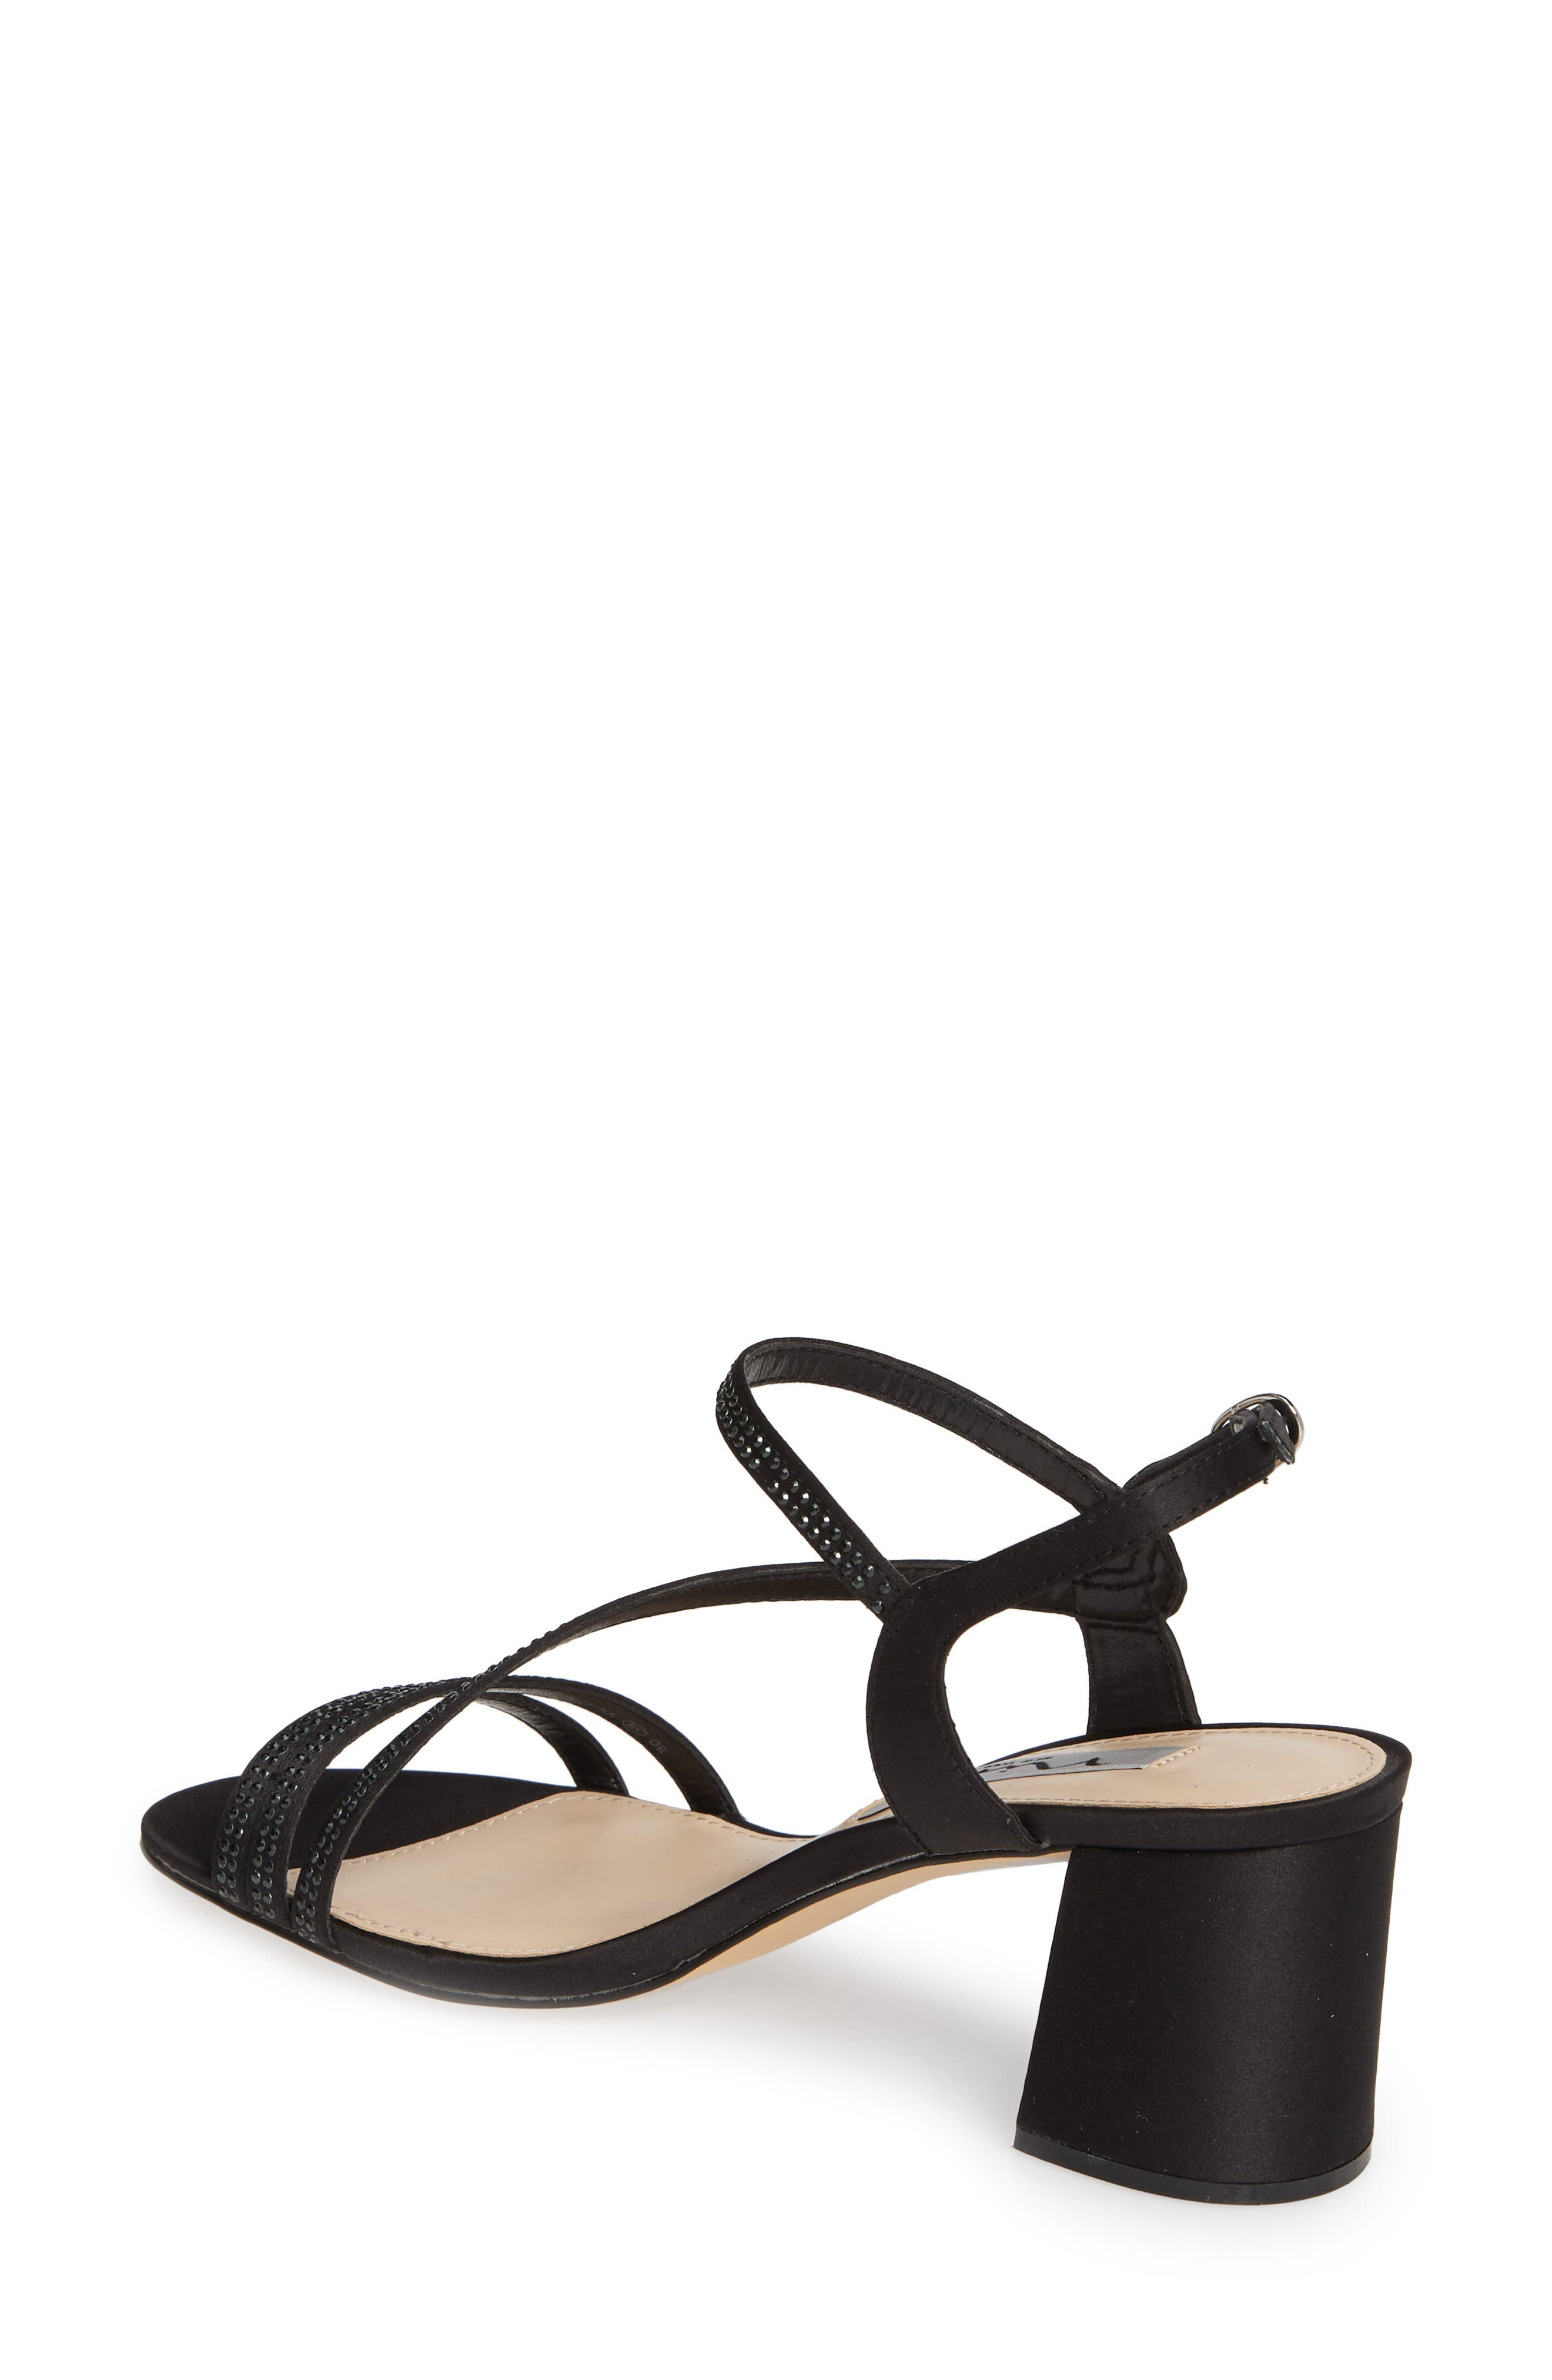 NINA, Naura Block Heel Sandal, Alternate thumbnail 2, color, BLACK SATIN